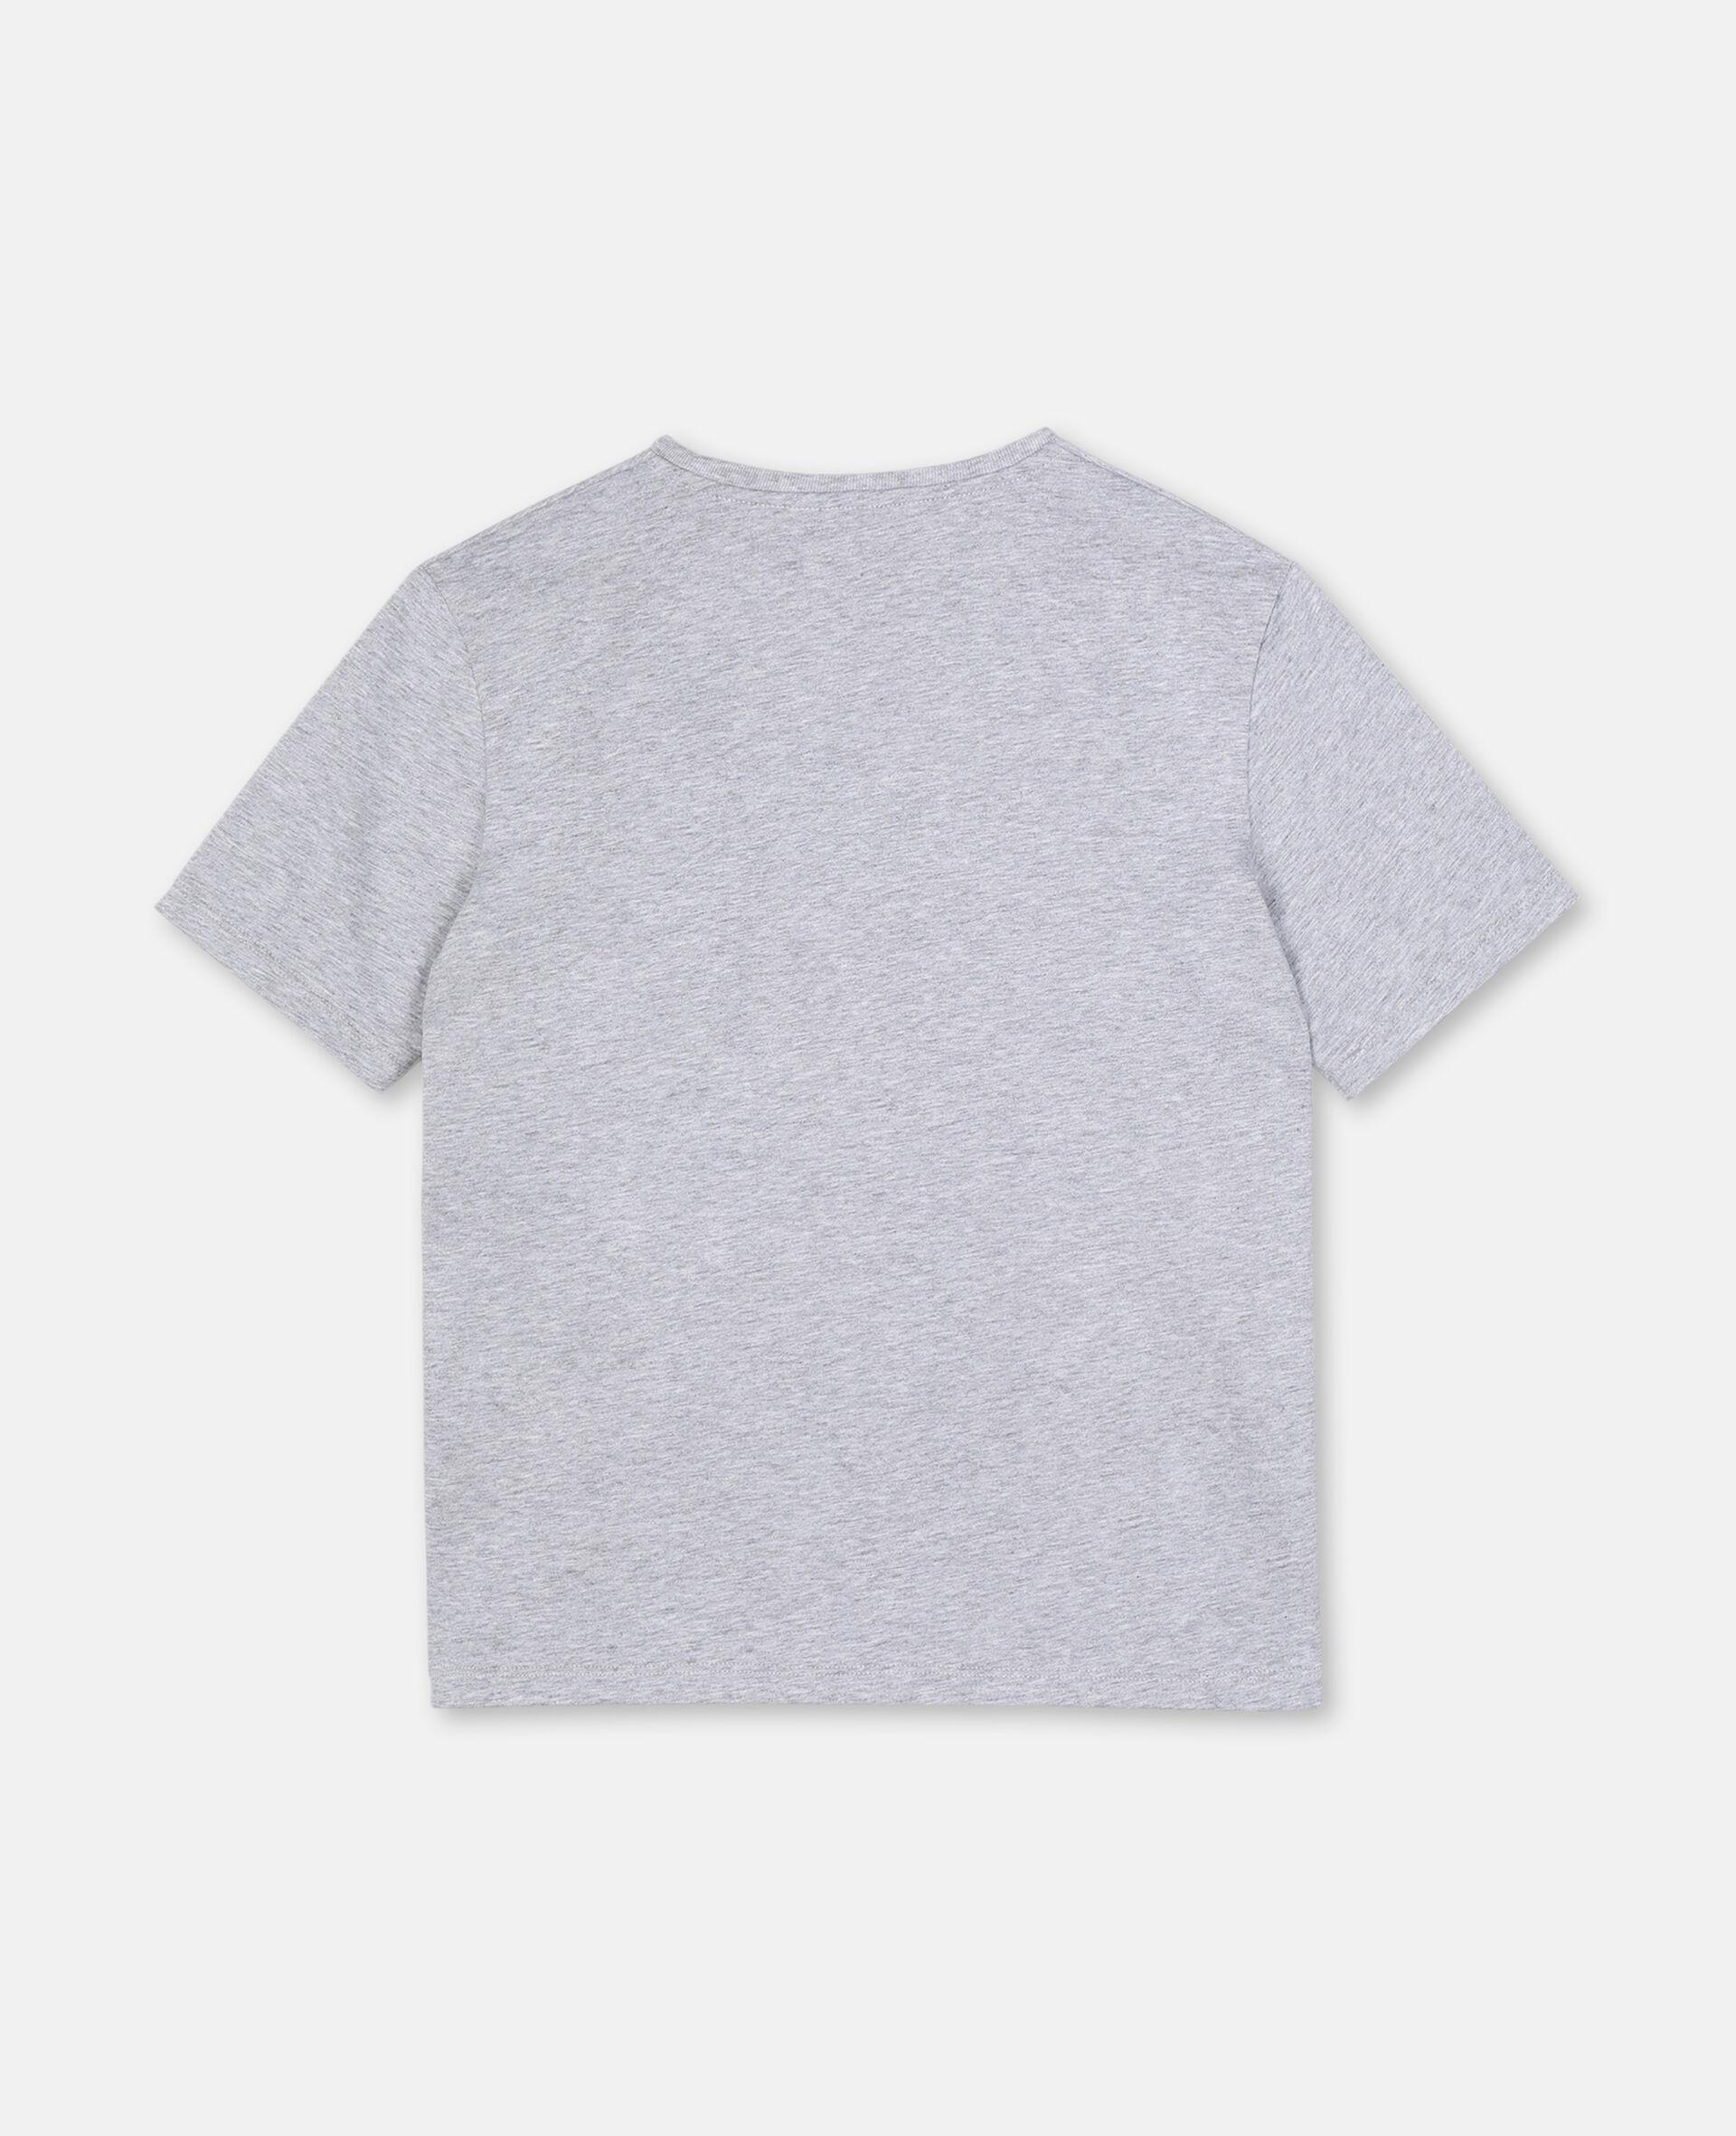 T-shirt oversize avec motif carte postale-Blanc-large image number 3